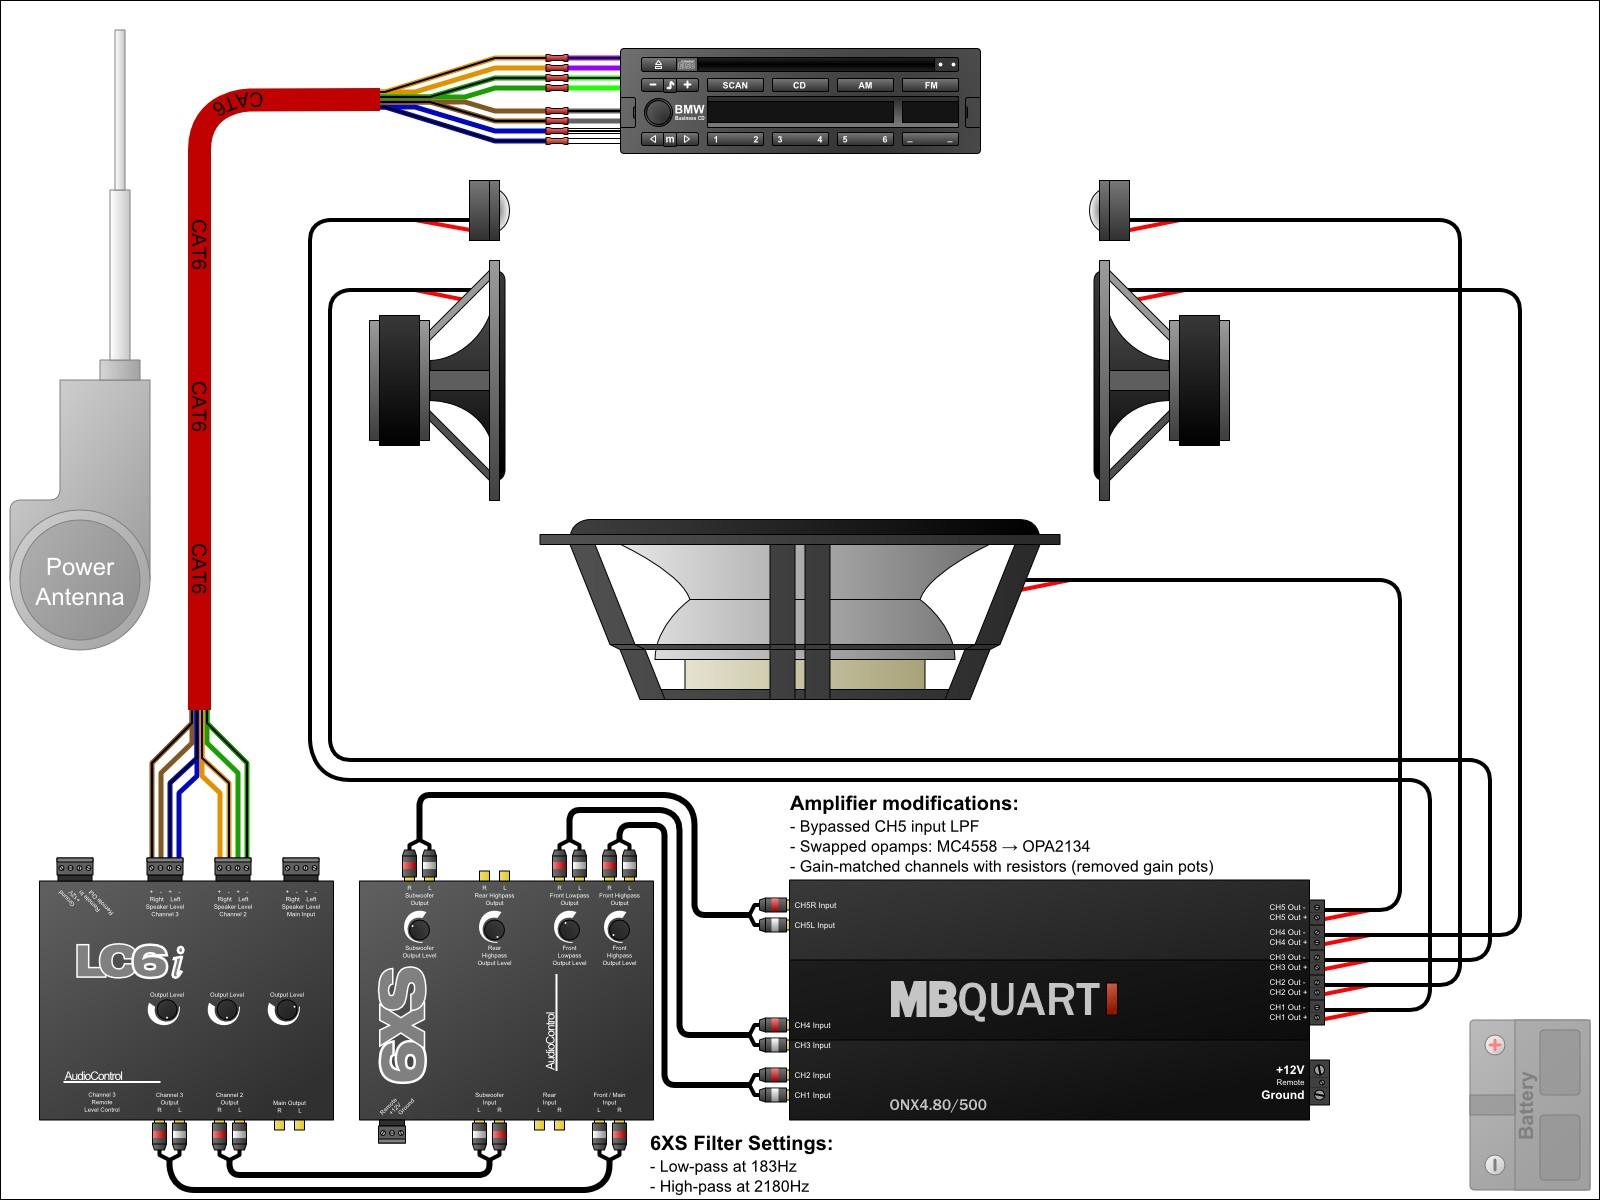 car audio crossover installation diagram my wiring diagram rh detoxicrecenze com Car Audio Speaker Wiring Diagram Car Audio System Wiring Diagram